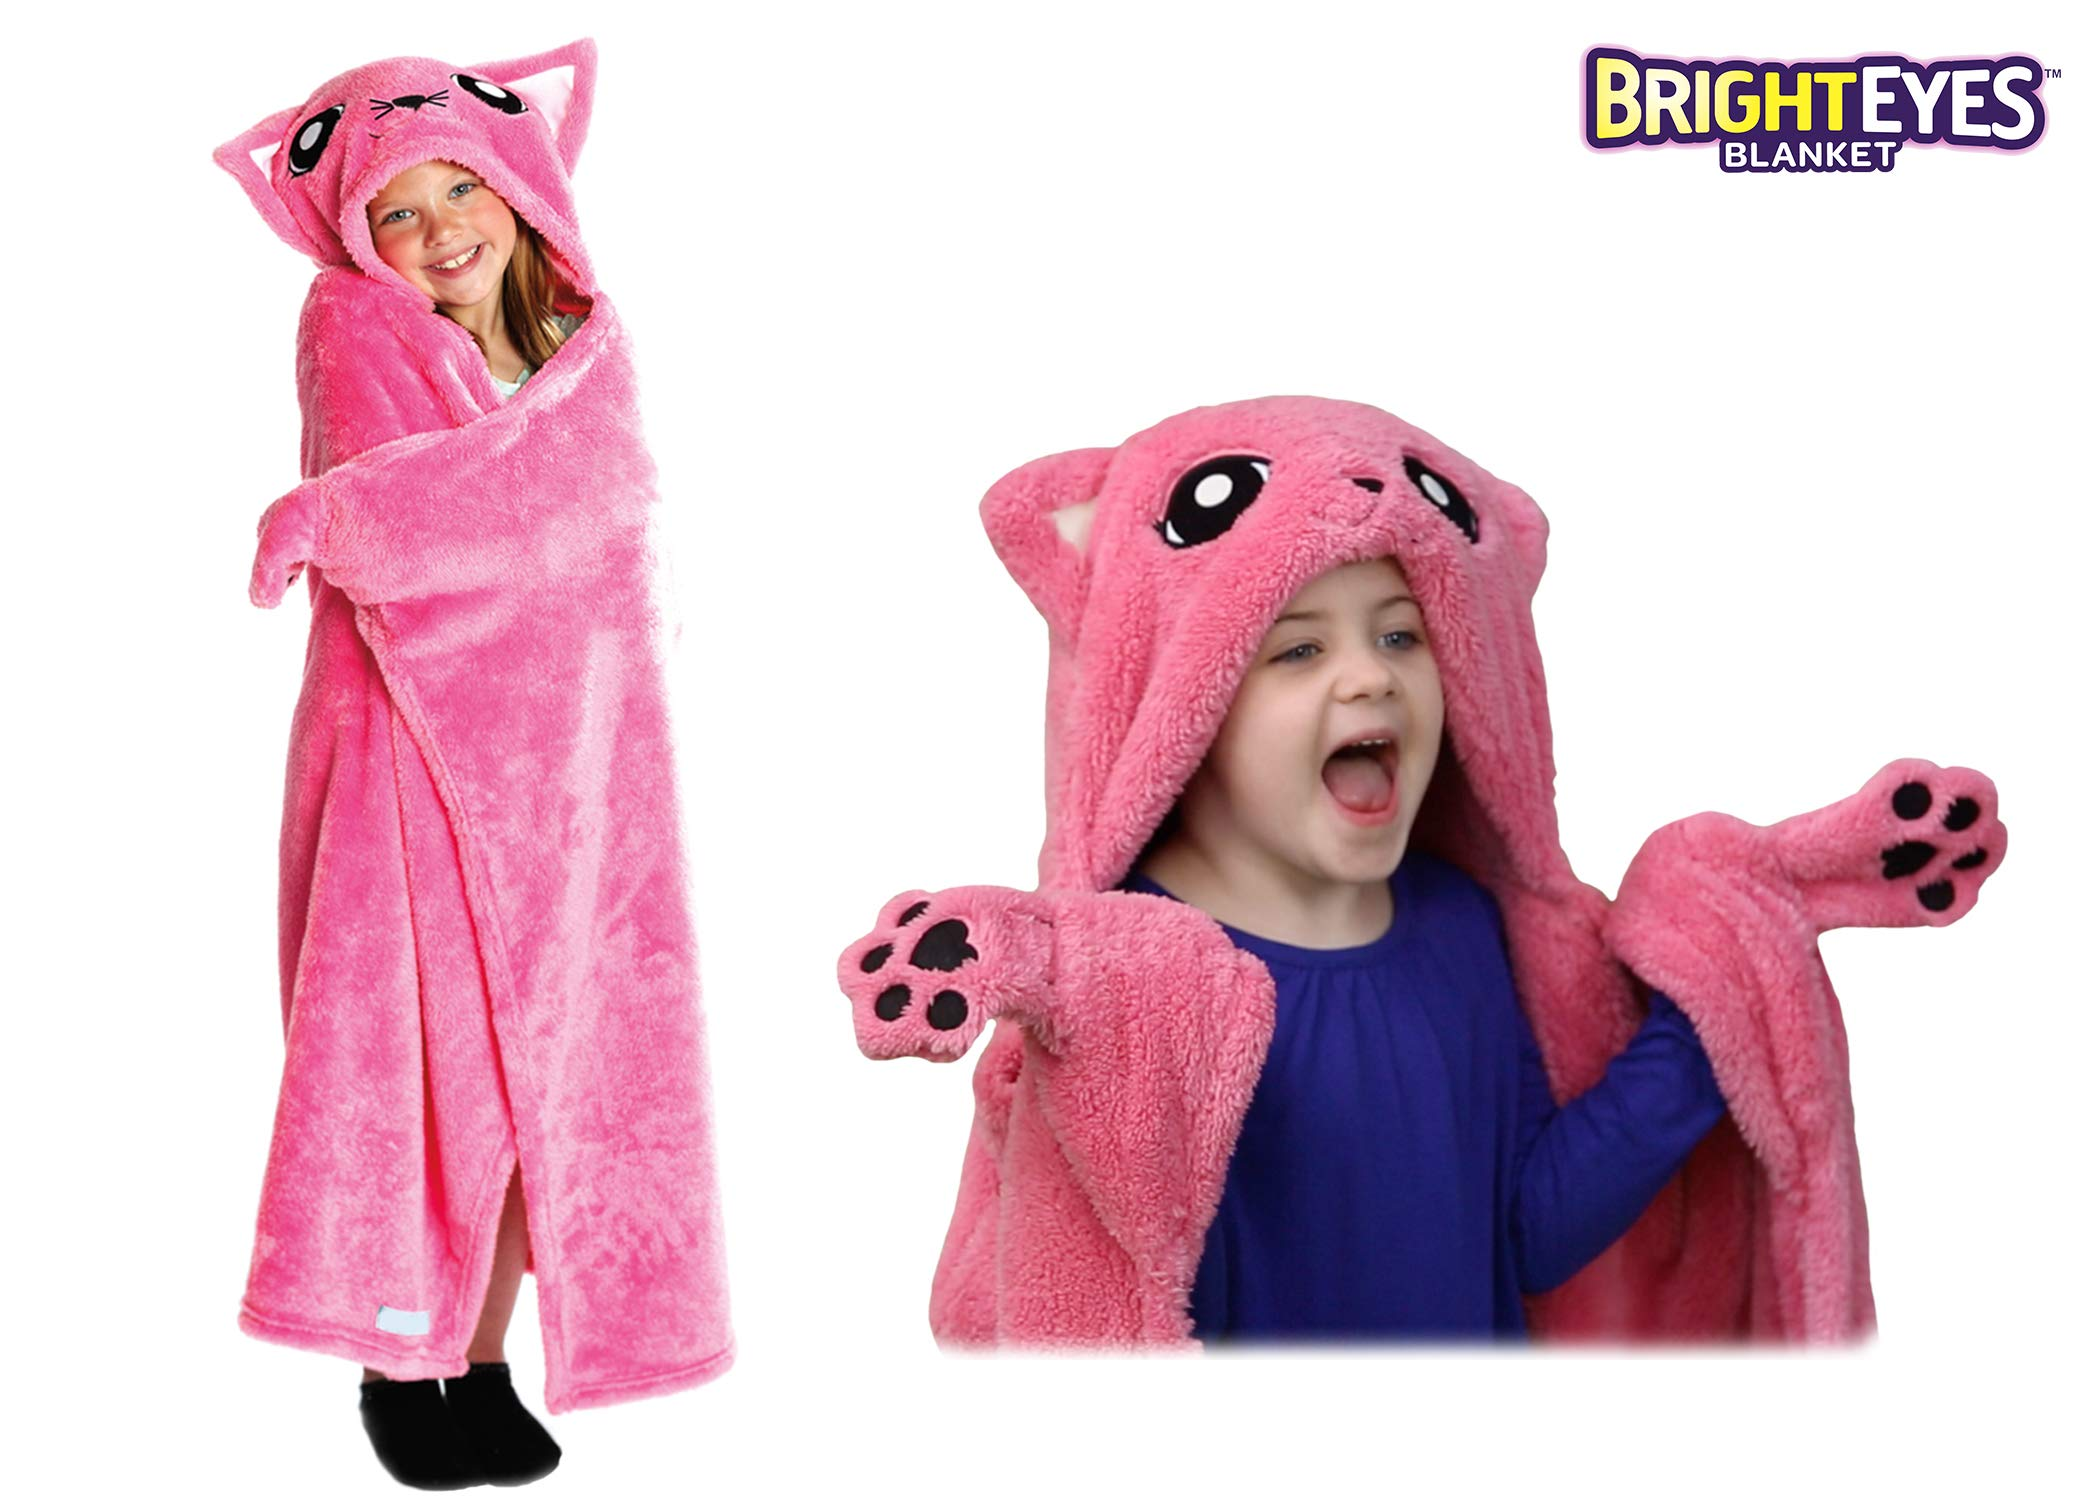 Bright Eyes Blanket - Super Soft Snuggie for Kids - Hooded, Blanket, Robe - Comfy Throw Blanket, Pink Kitten; Warm Fuzzy Blanket, Stuffed Animal Blanket - Machine Washable - Perfect for Sleepovers!